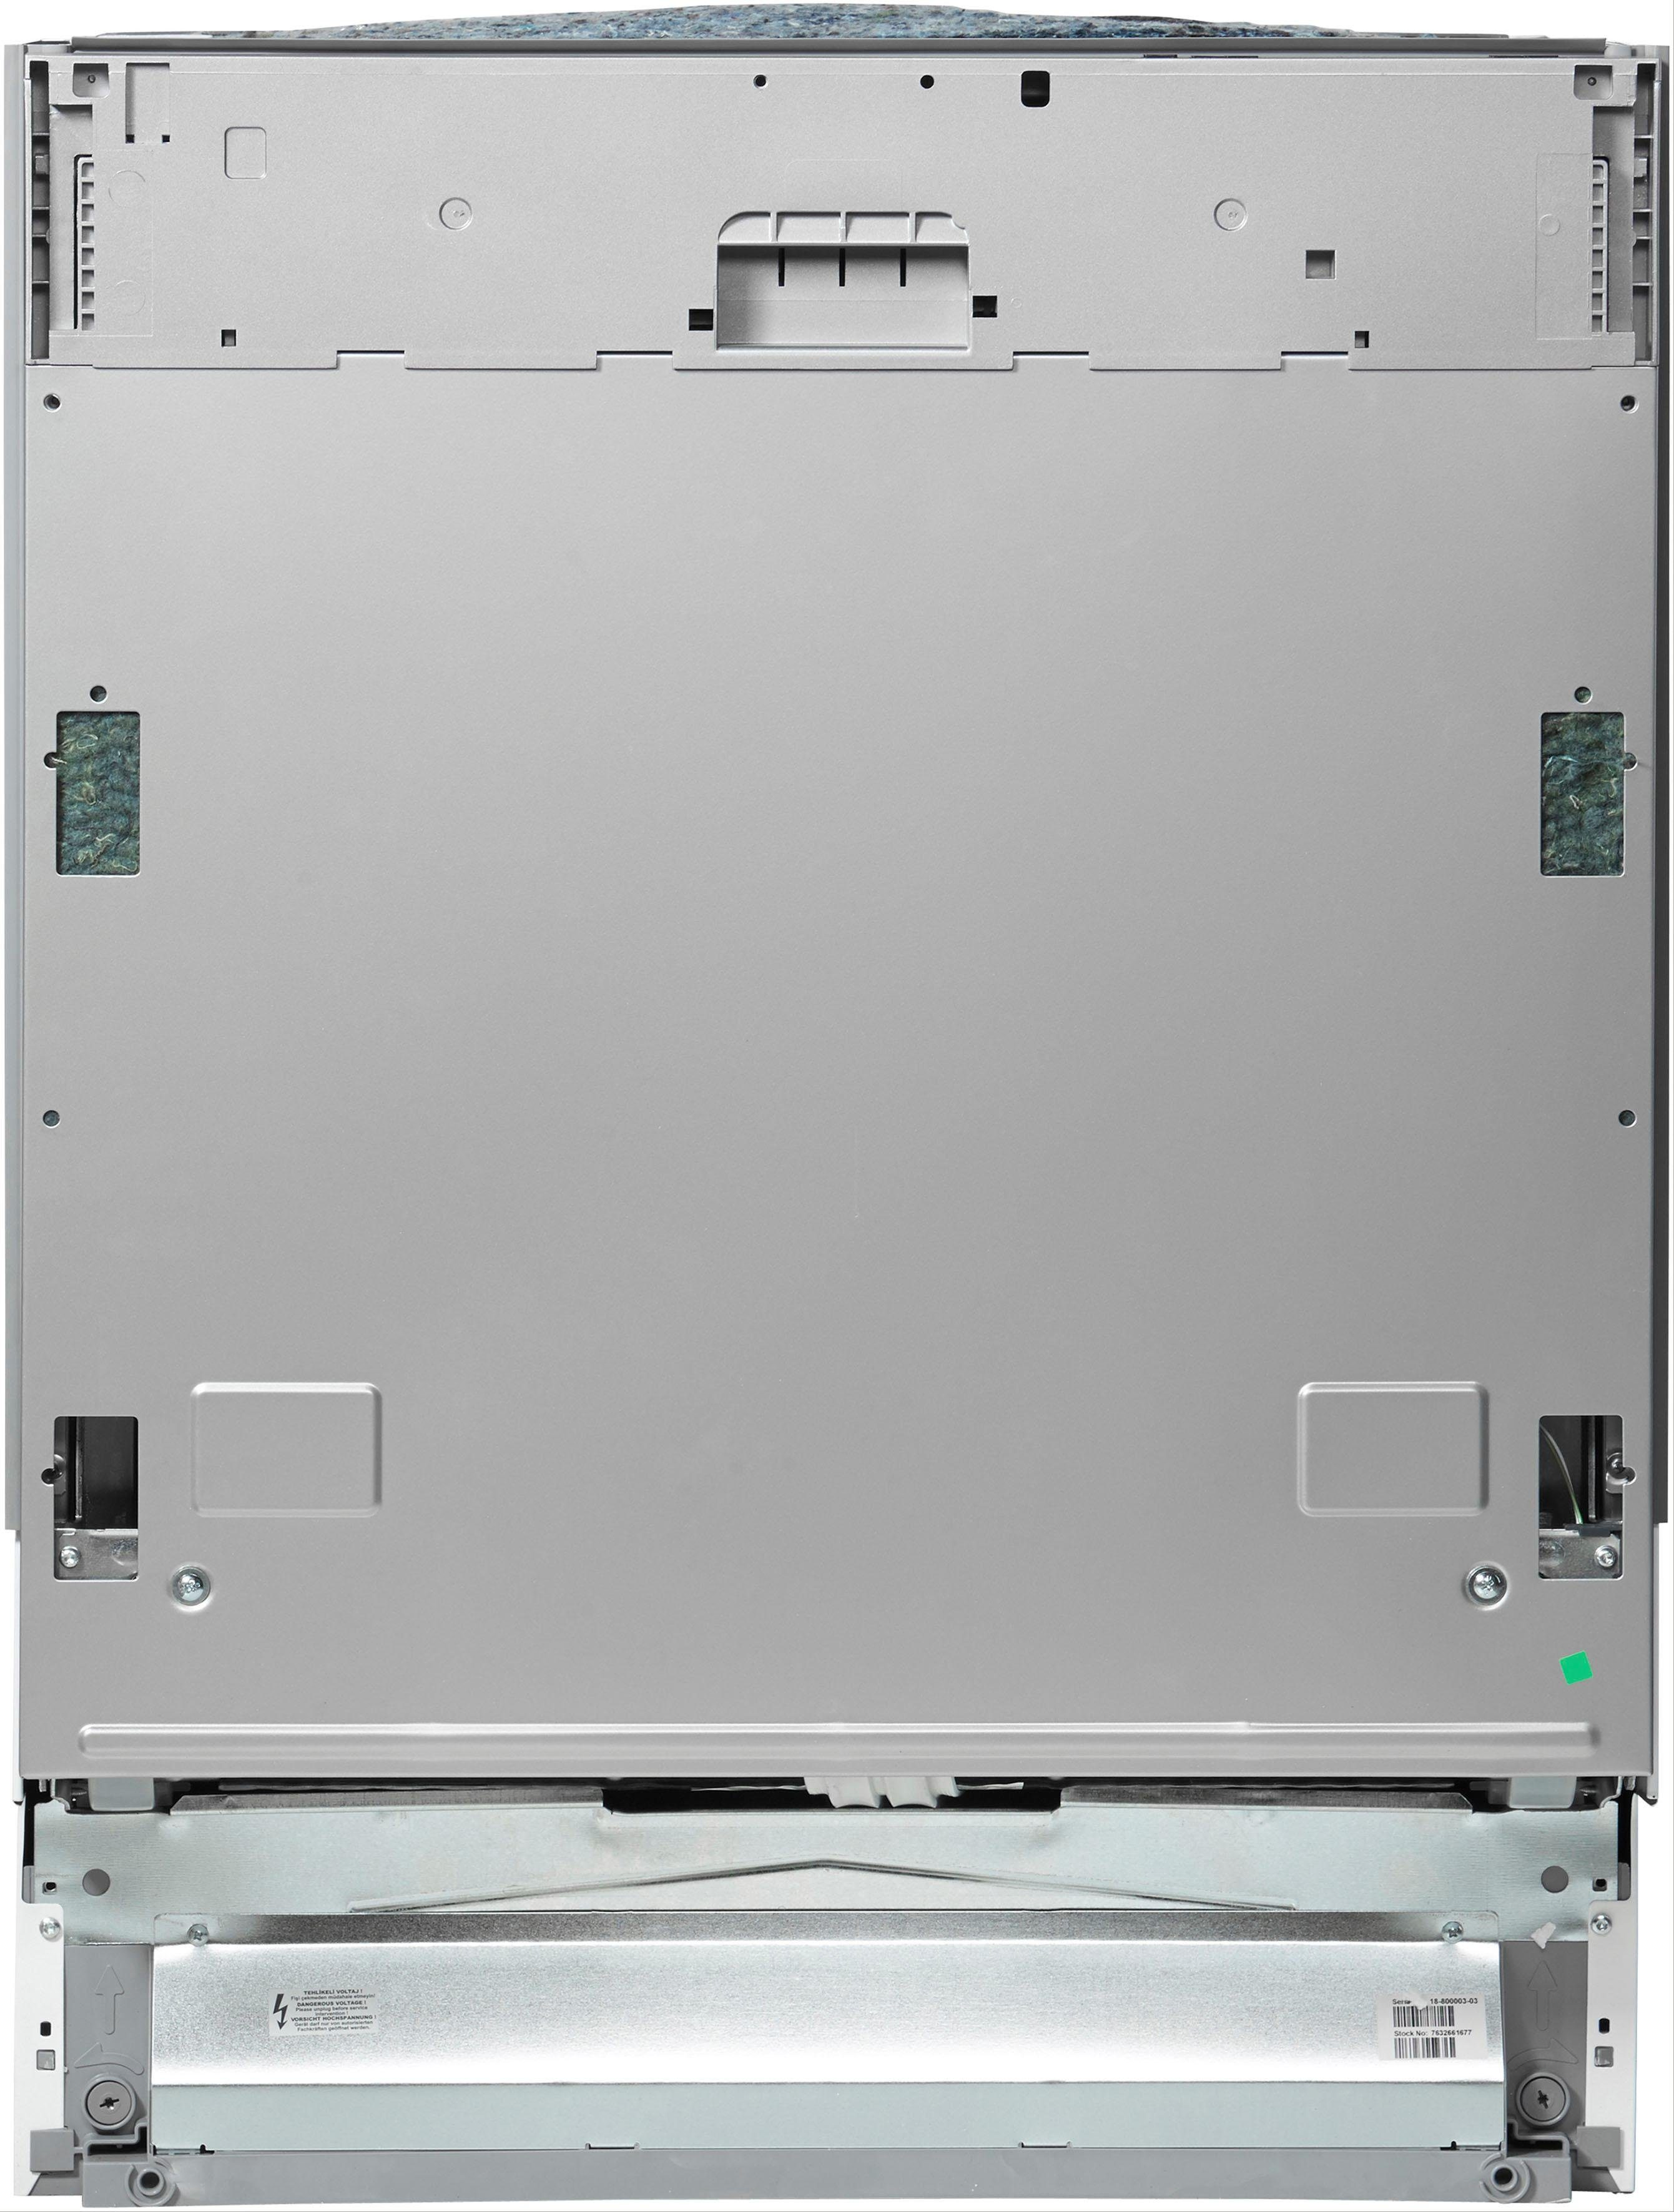 BEKO vollintegrierbarer Geschirrspüler DO55420, DVO55420W4Y, 9,5 l, 14 Maßgedecke